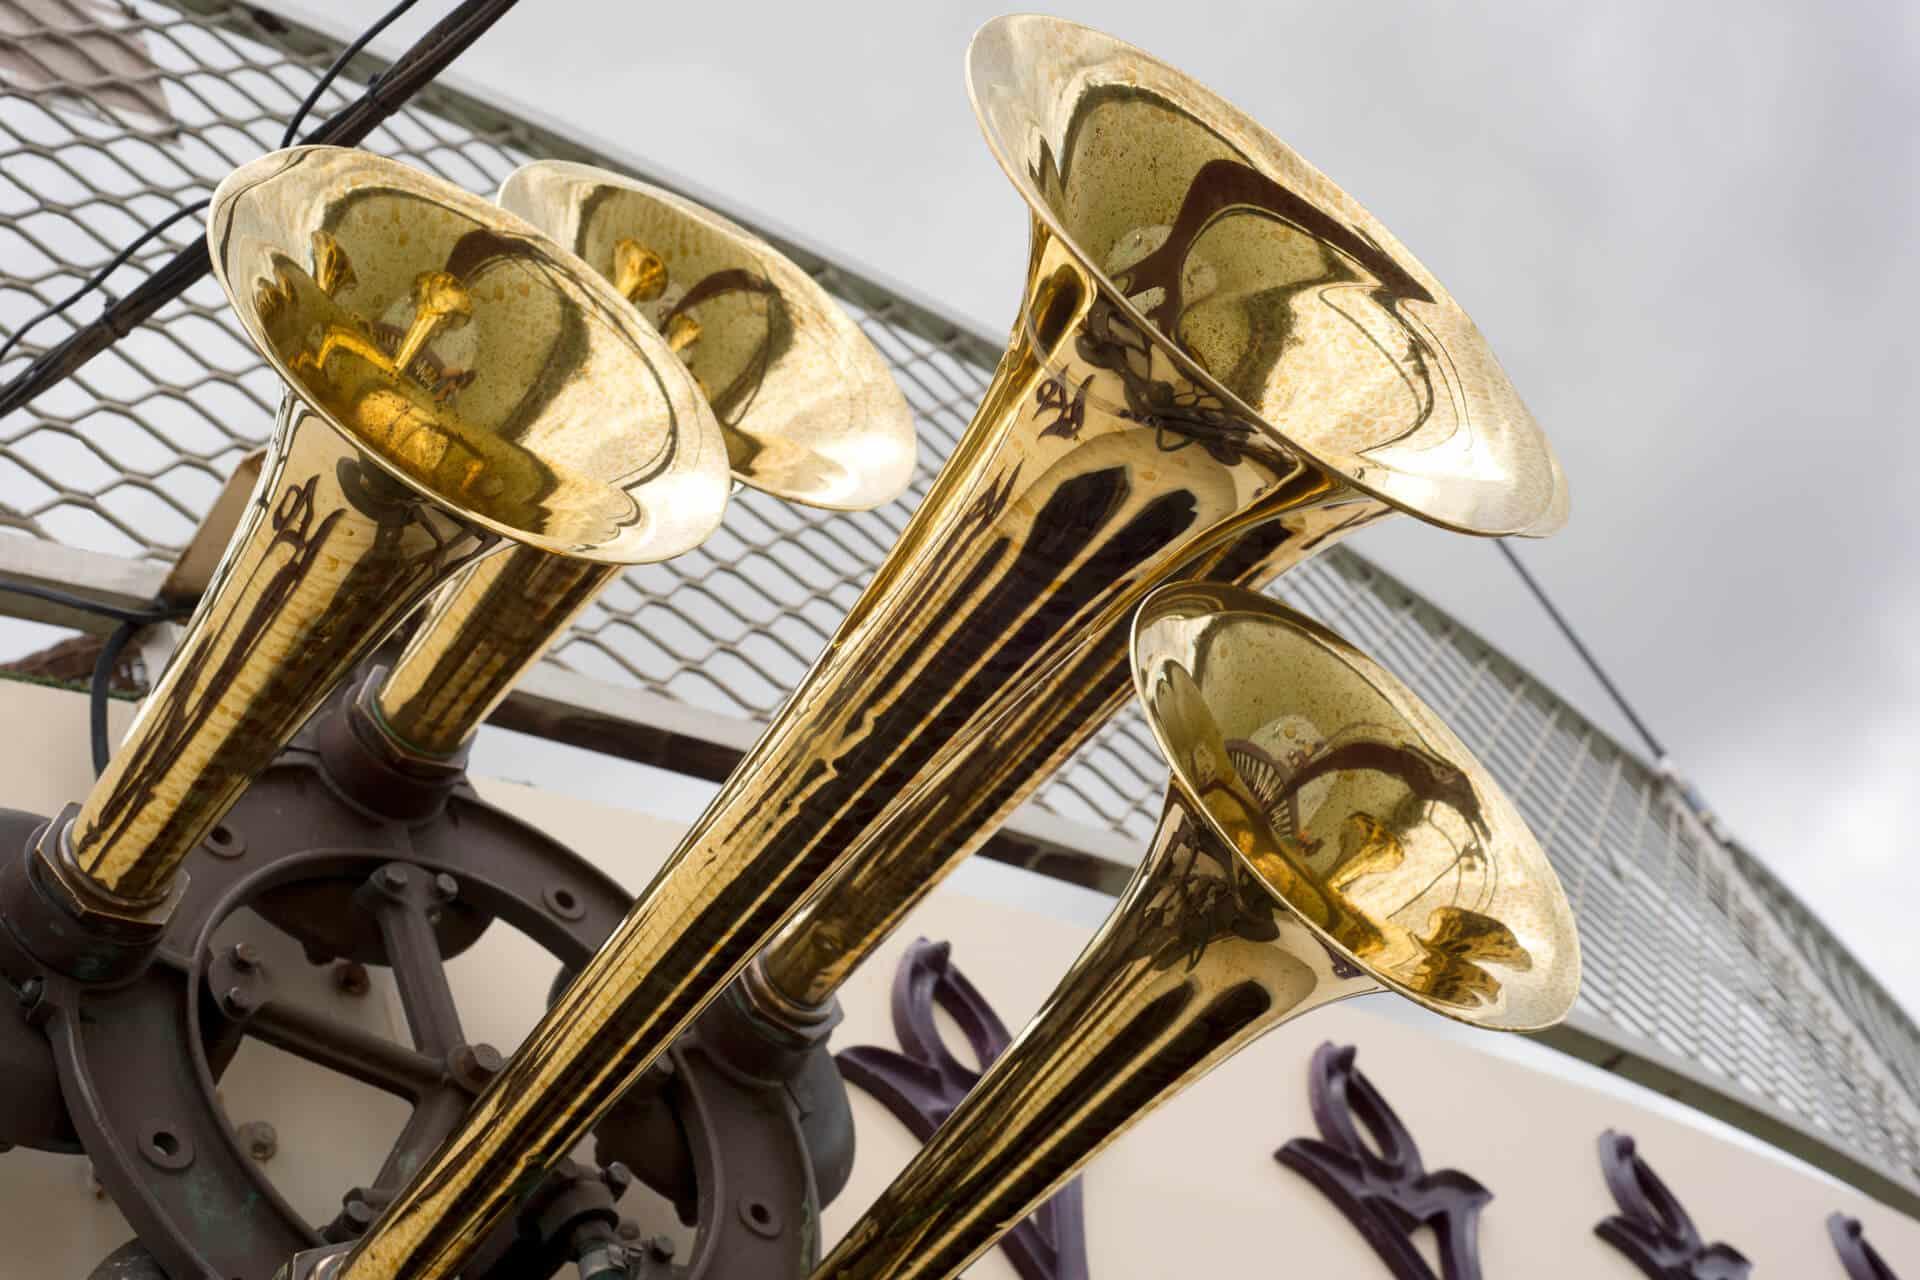 Brass horns on the Murray princess